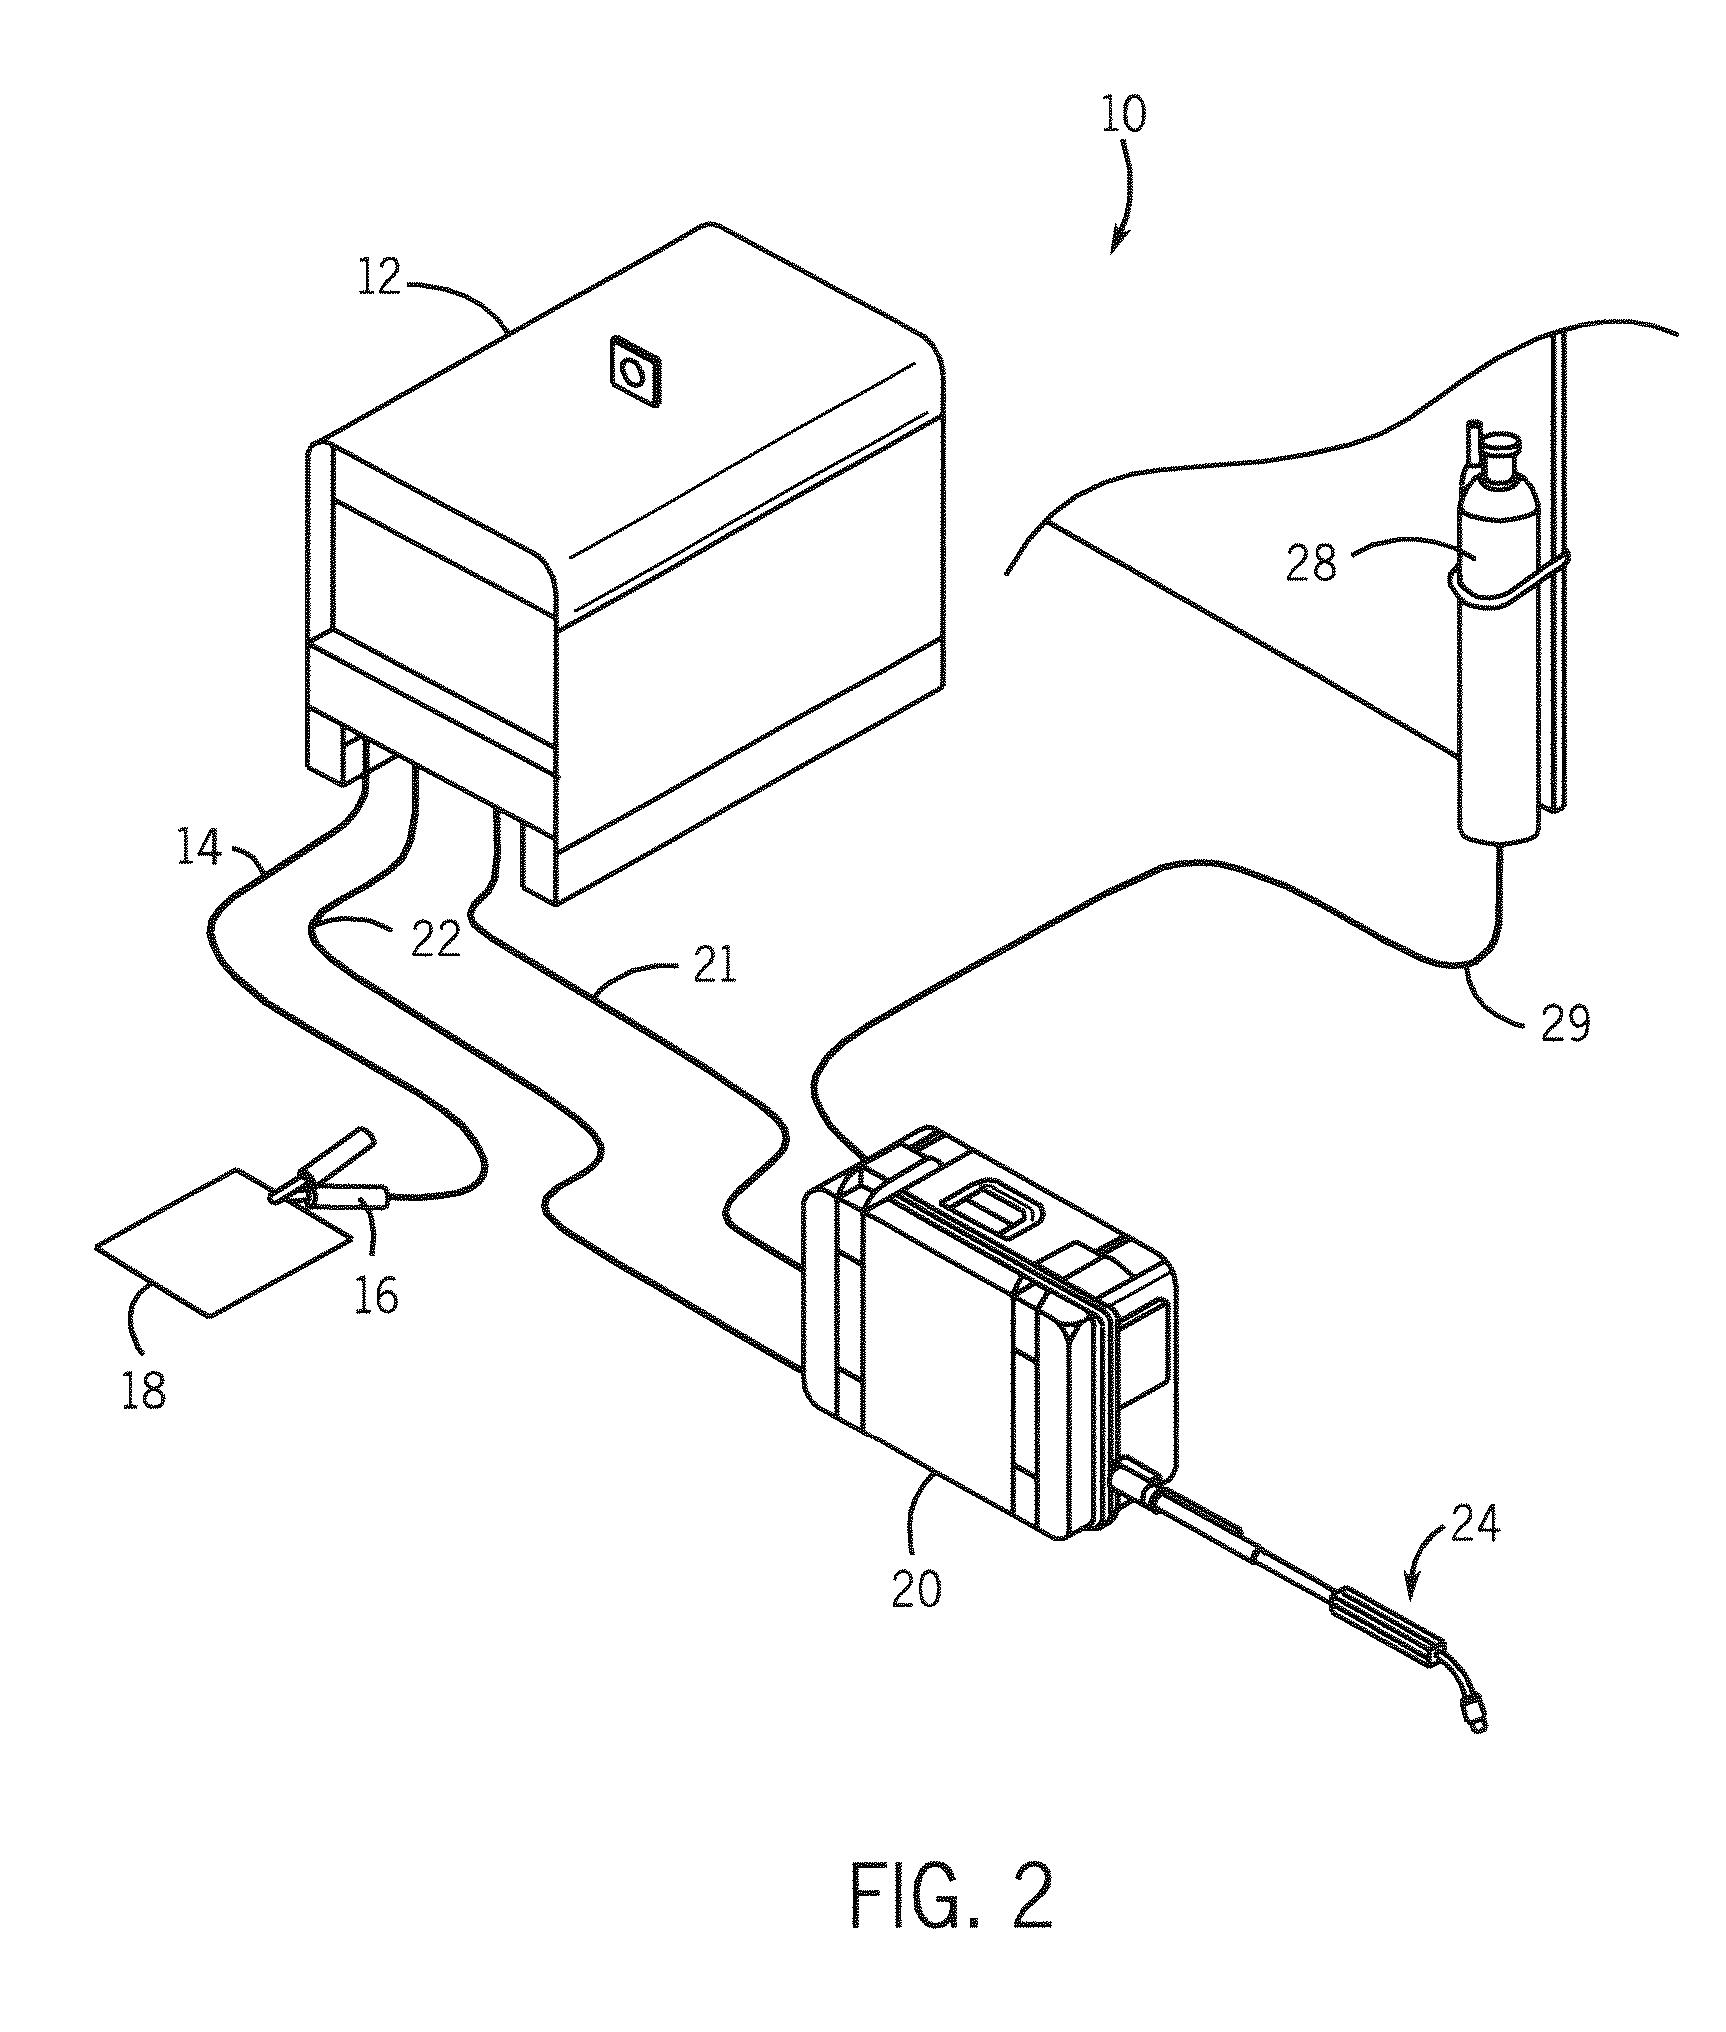 Mig welding block diagram patent us7049545 mig welding machine having 115v inverter design